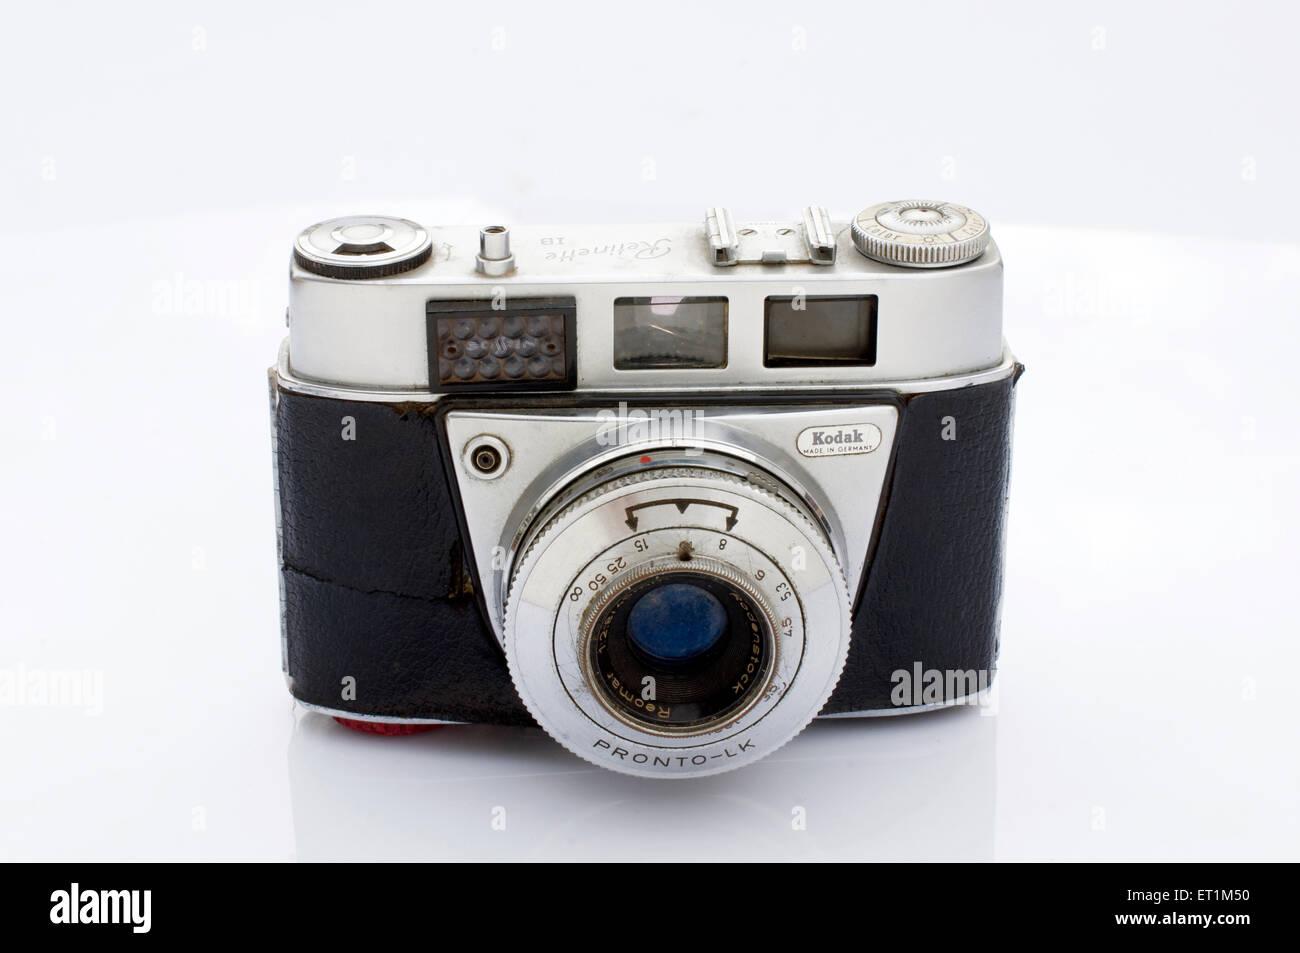 Un Kodak Retinette 1B film appareil Pune Maharashtra Inde Asie Photo Stock